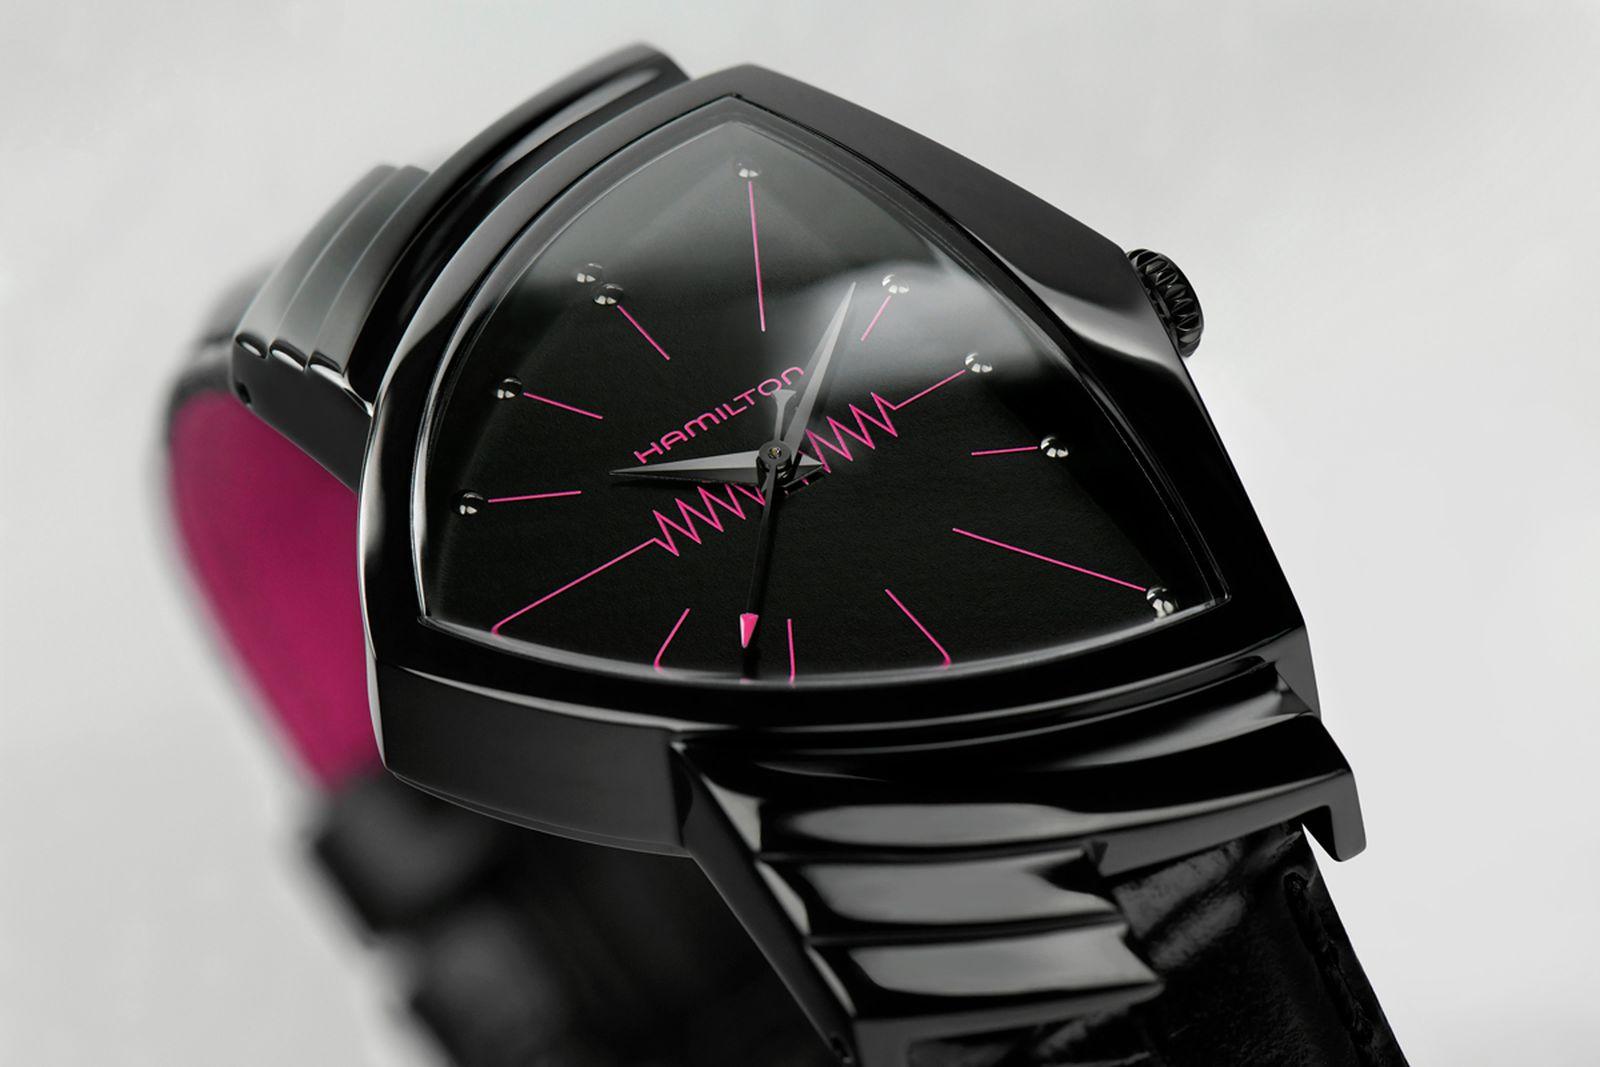 poggy-the-man-hamilton-watch-collab-03